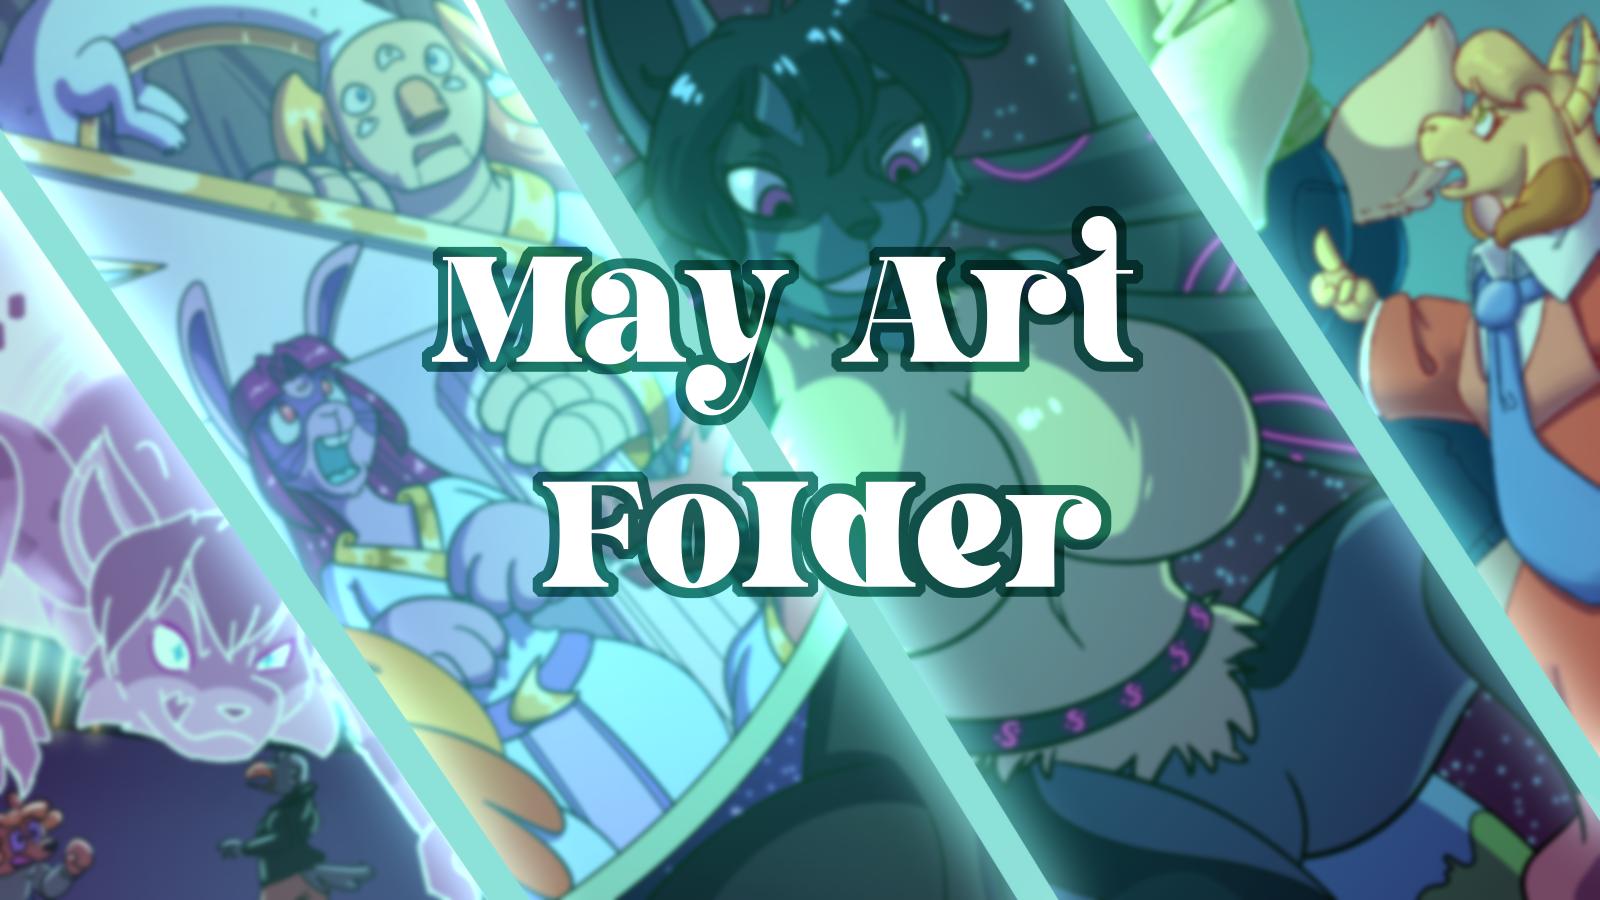 Mayfolder